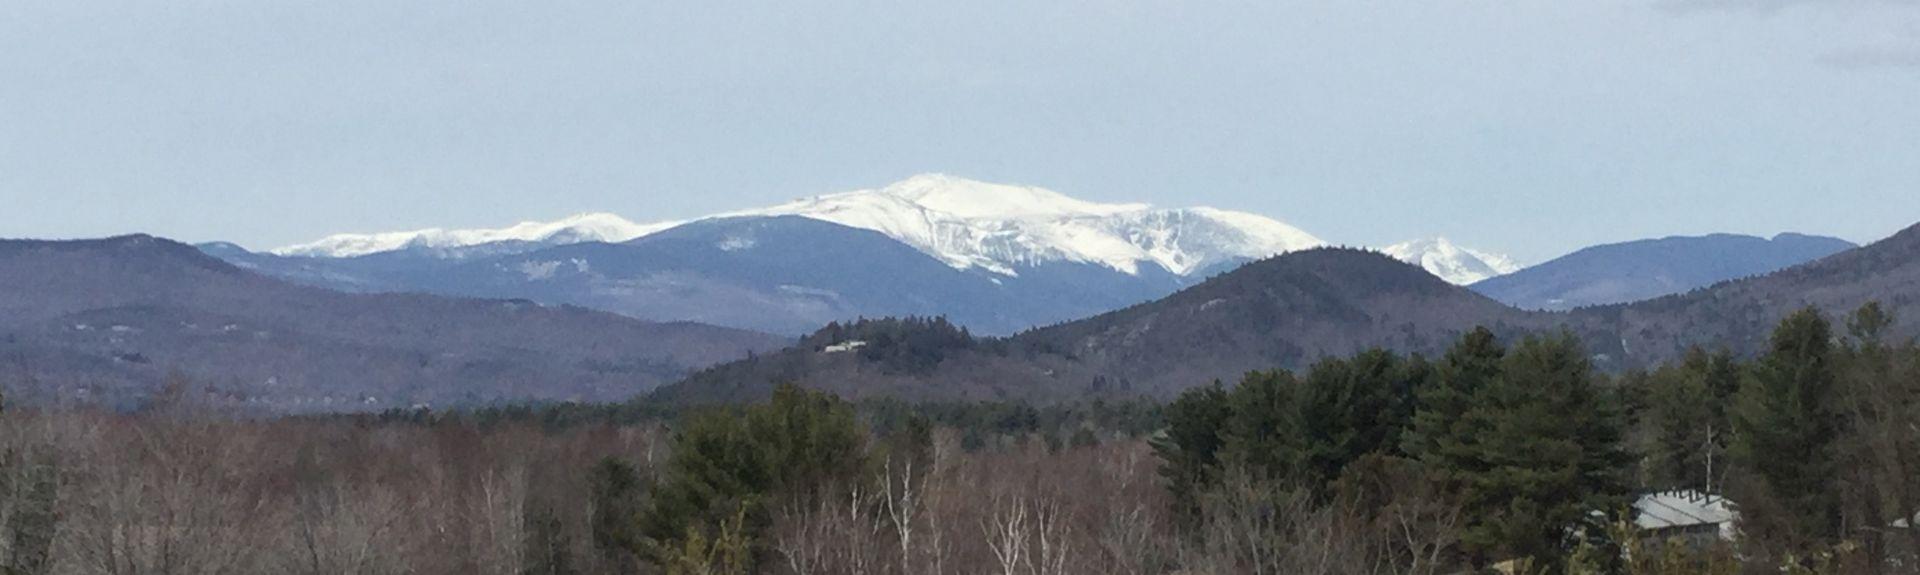 The Seasons at Attitash (Bartlett, New Hampshire, Estados Unidos)